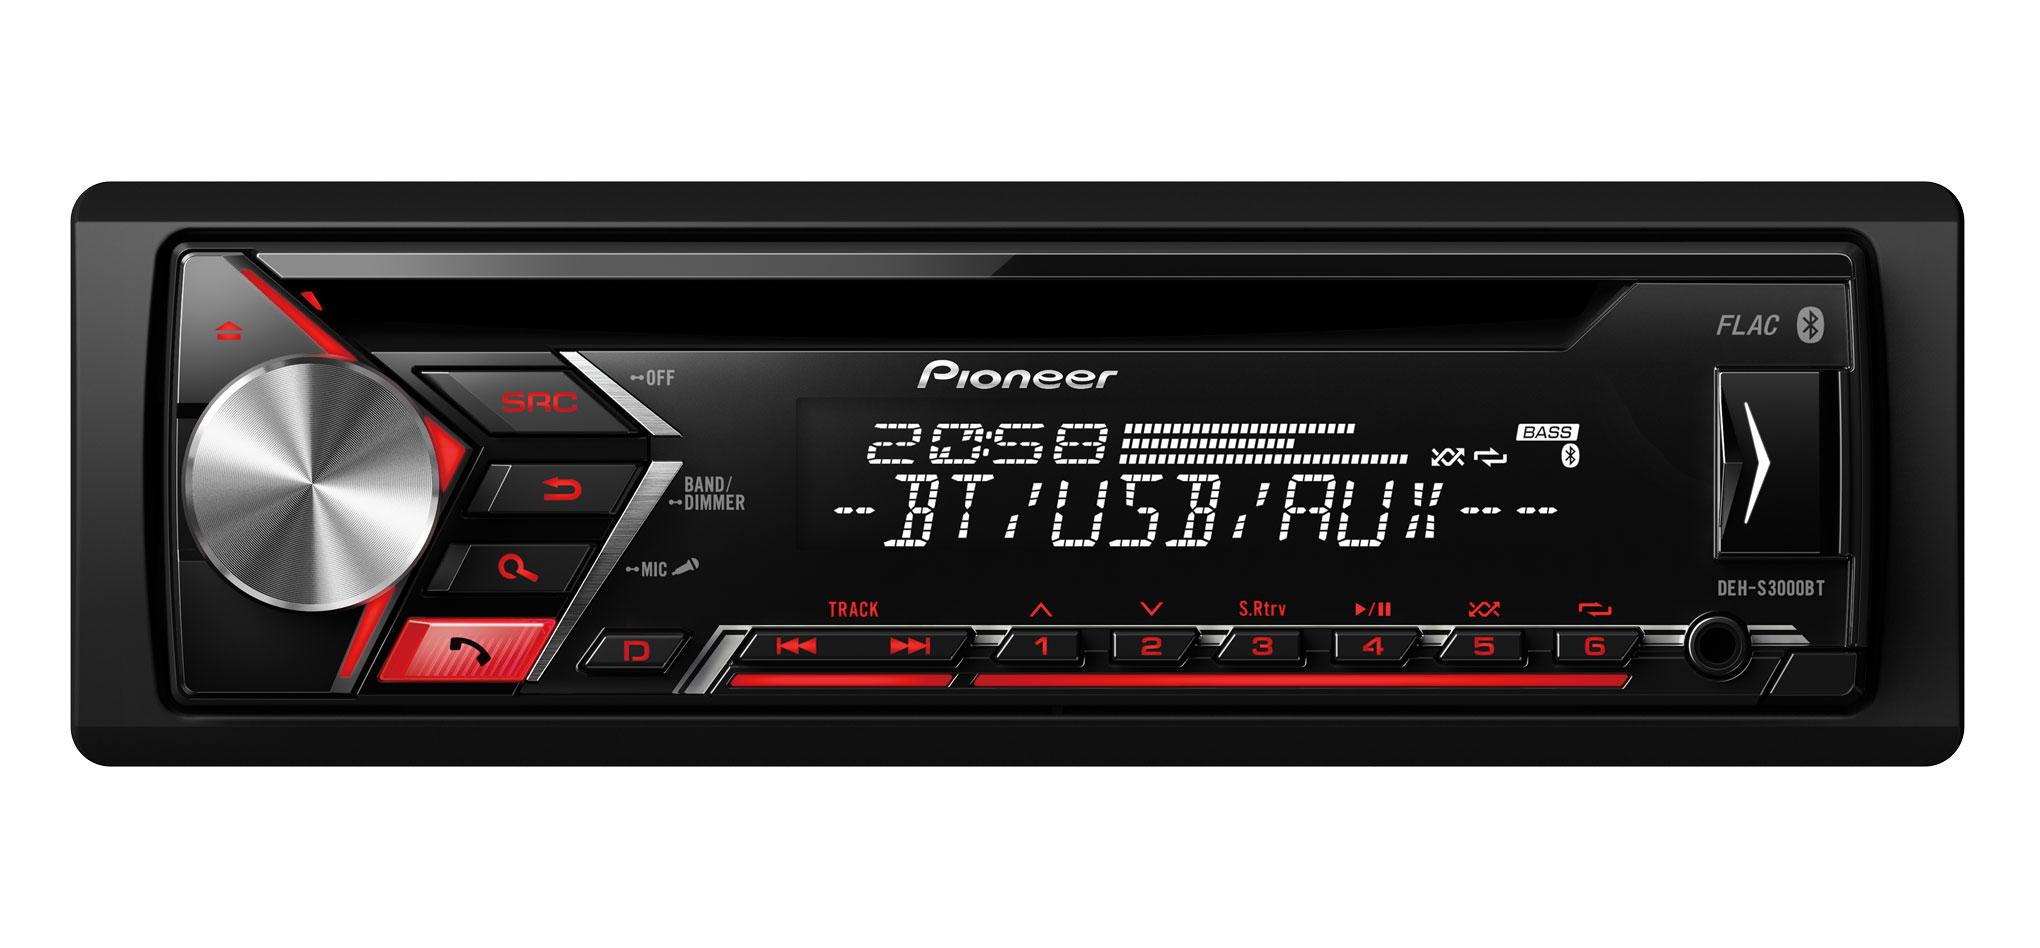 Pioneer Deh S3000bt Autoraadio Cd Mp3 Usb Aux